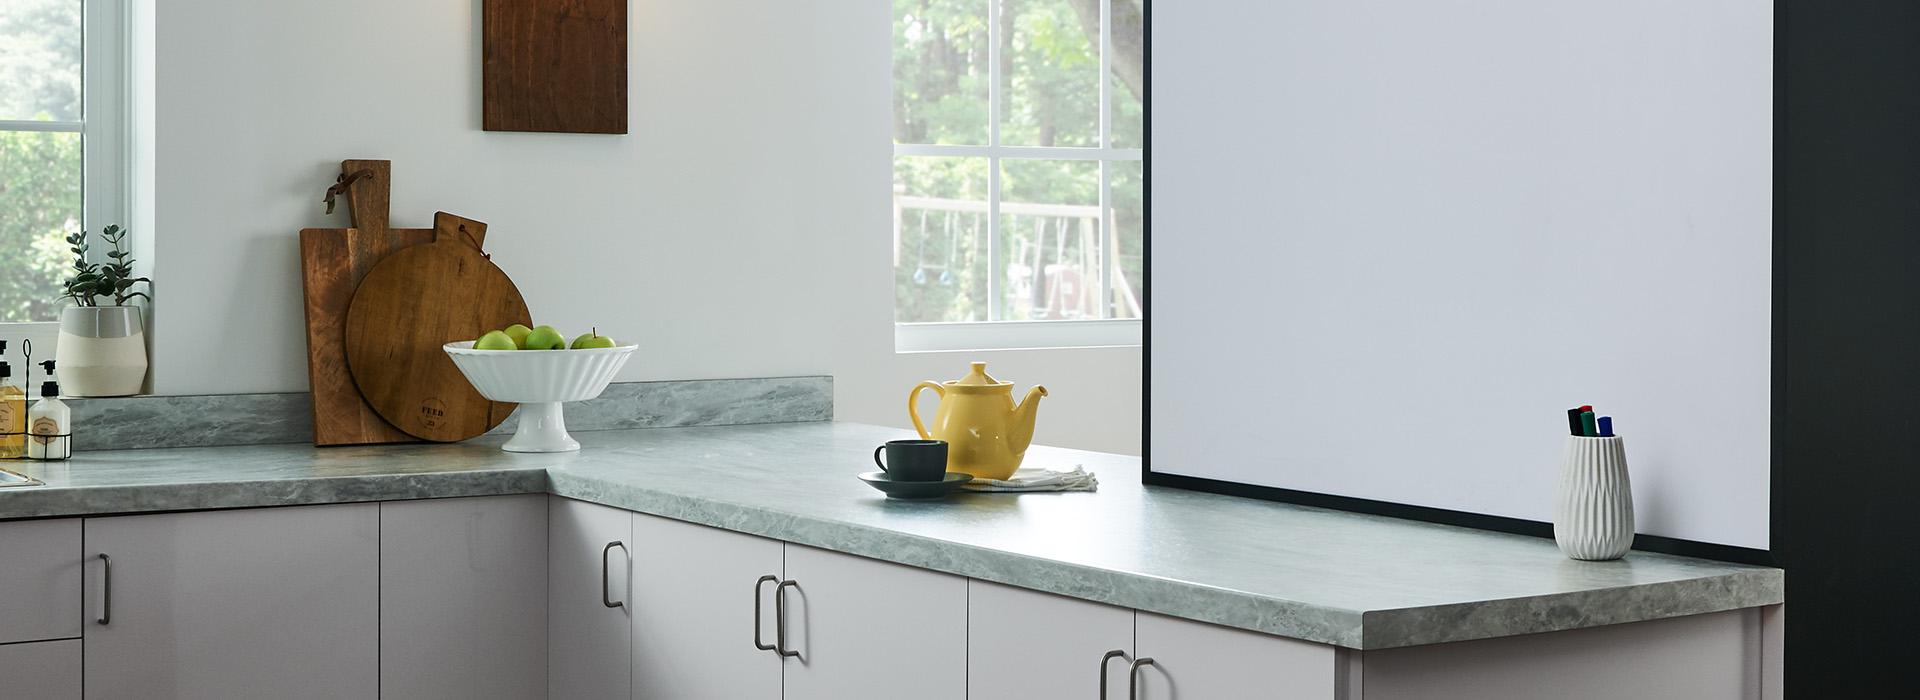 Dry erase board in kitchen with yellow teapot 949 White Writable Surfaces